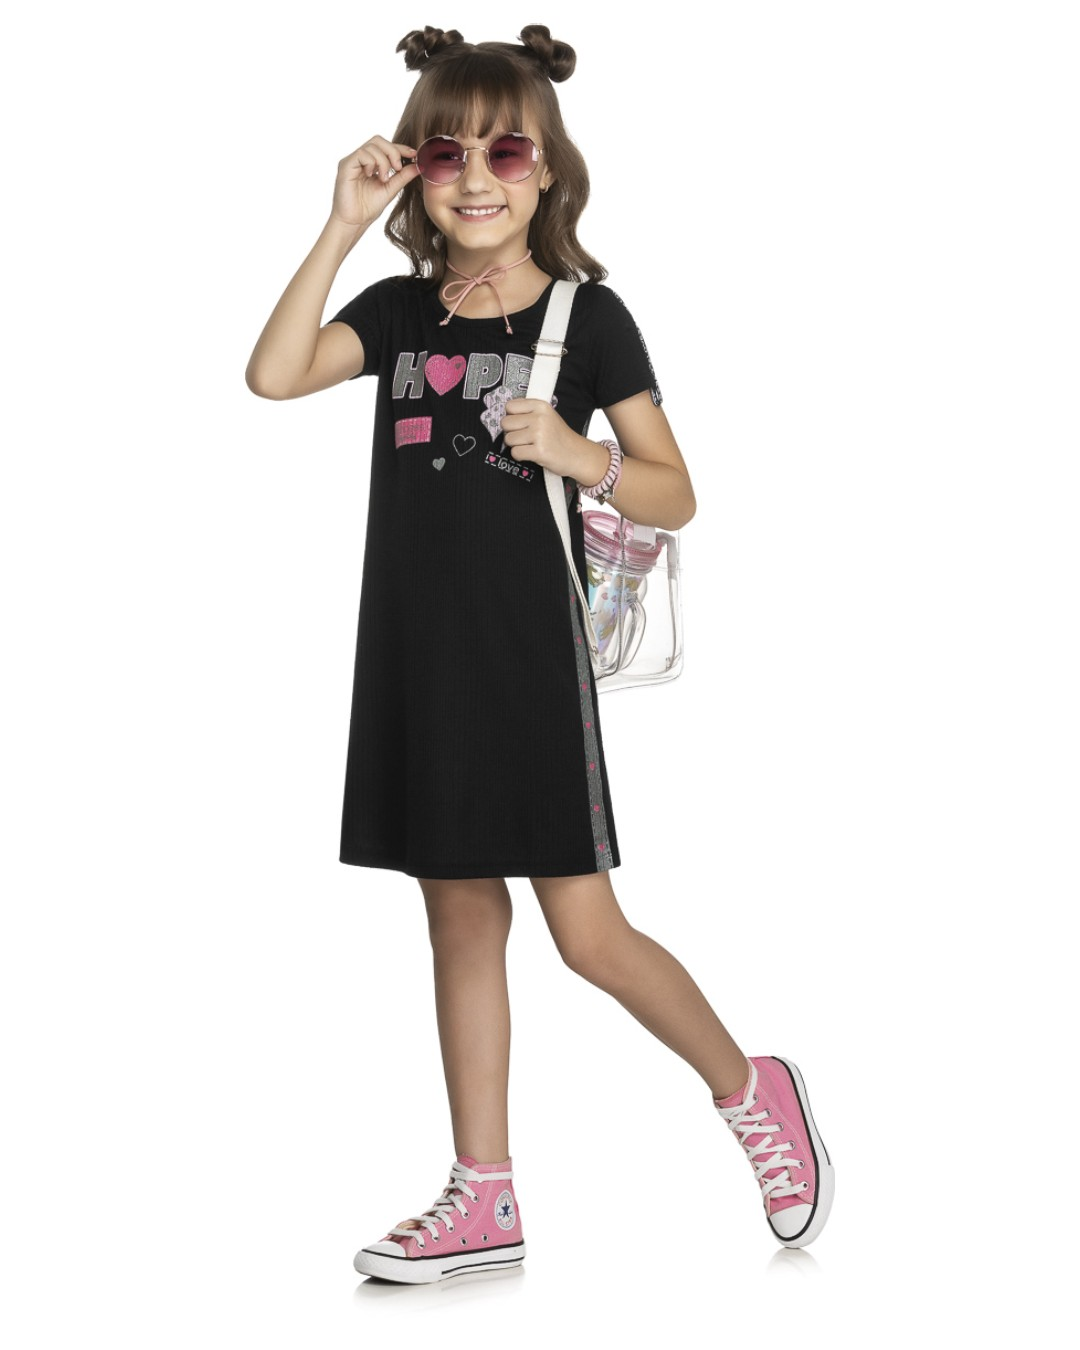 Vestido Infantil Hope Love - Kely & Kety